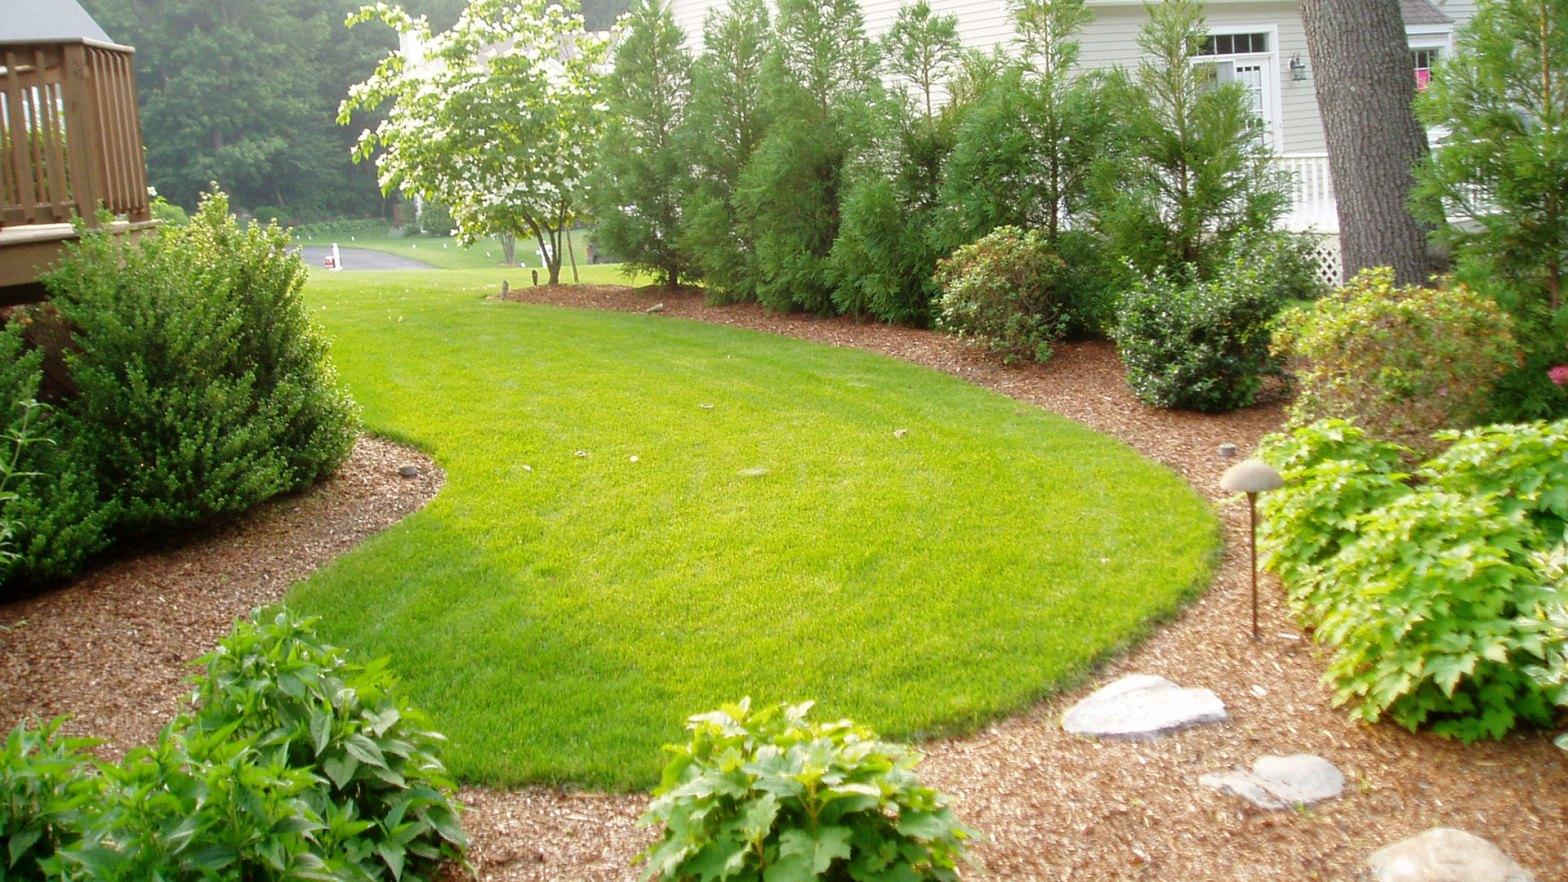 Backyard Landscaping Ideas - LAND DESIGNS UNLIMITED LLC